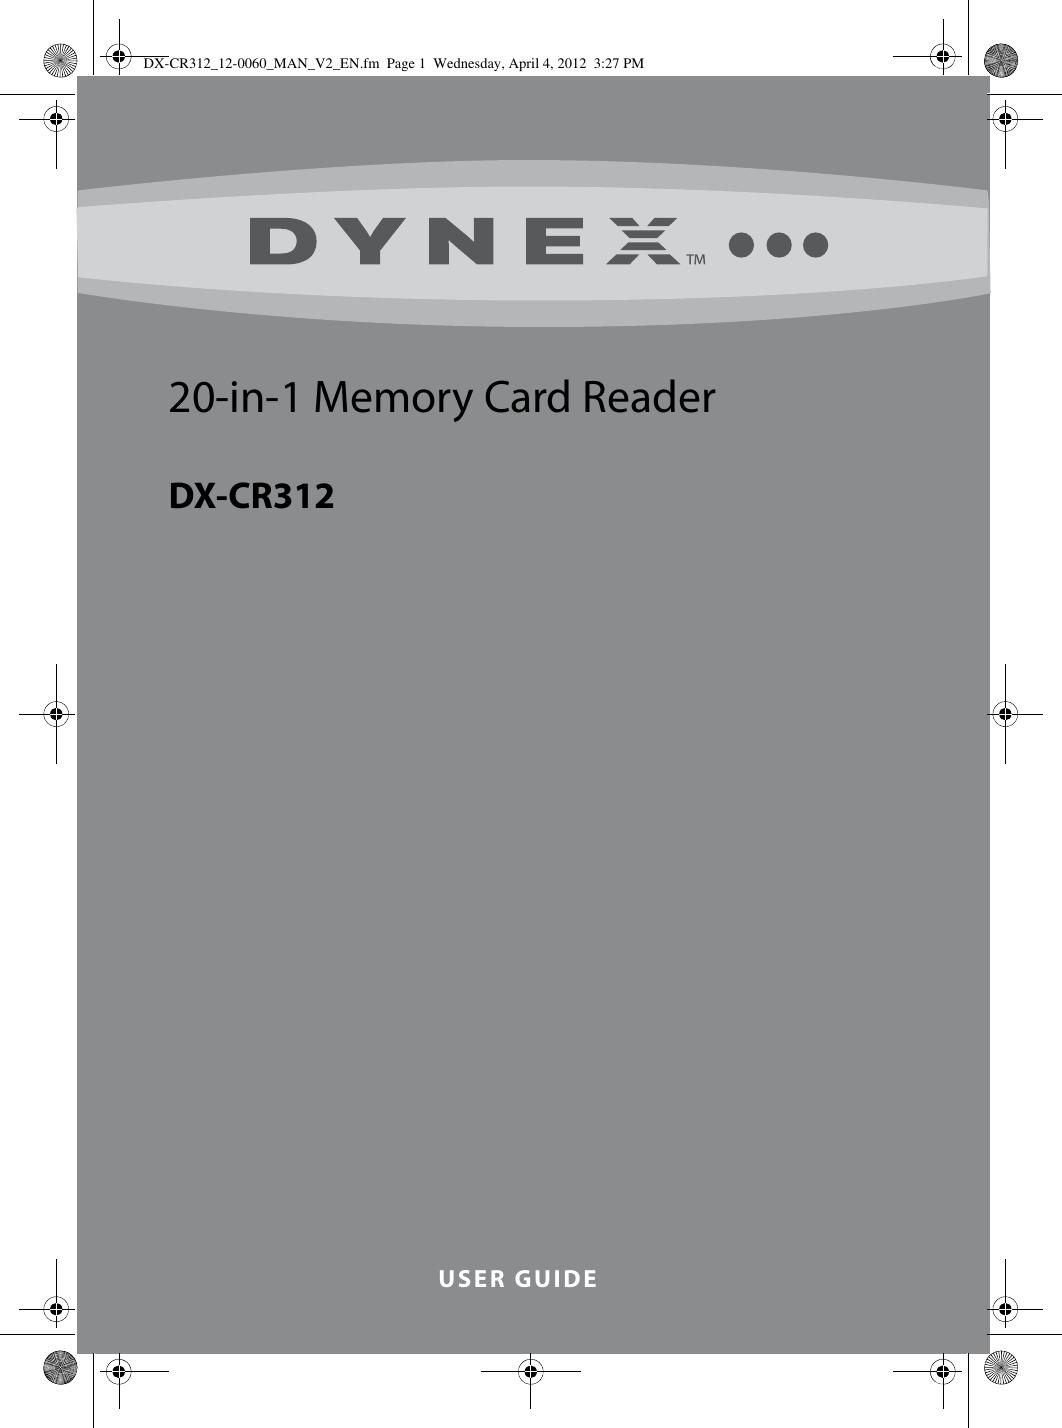 DYNEX DX-CR312 WINDOWS 7 DRIVERS DOWNLOAD (2019)